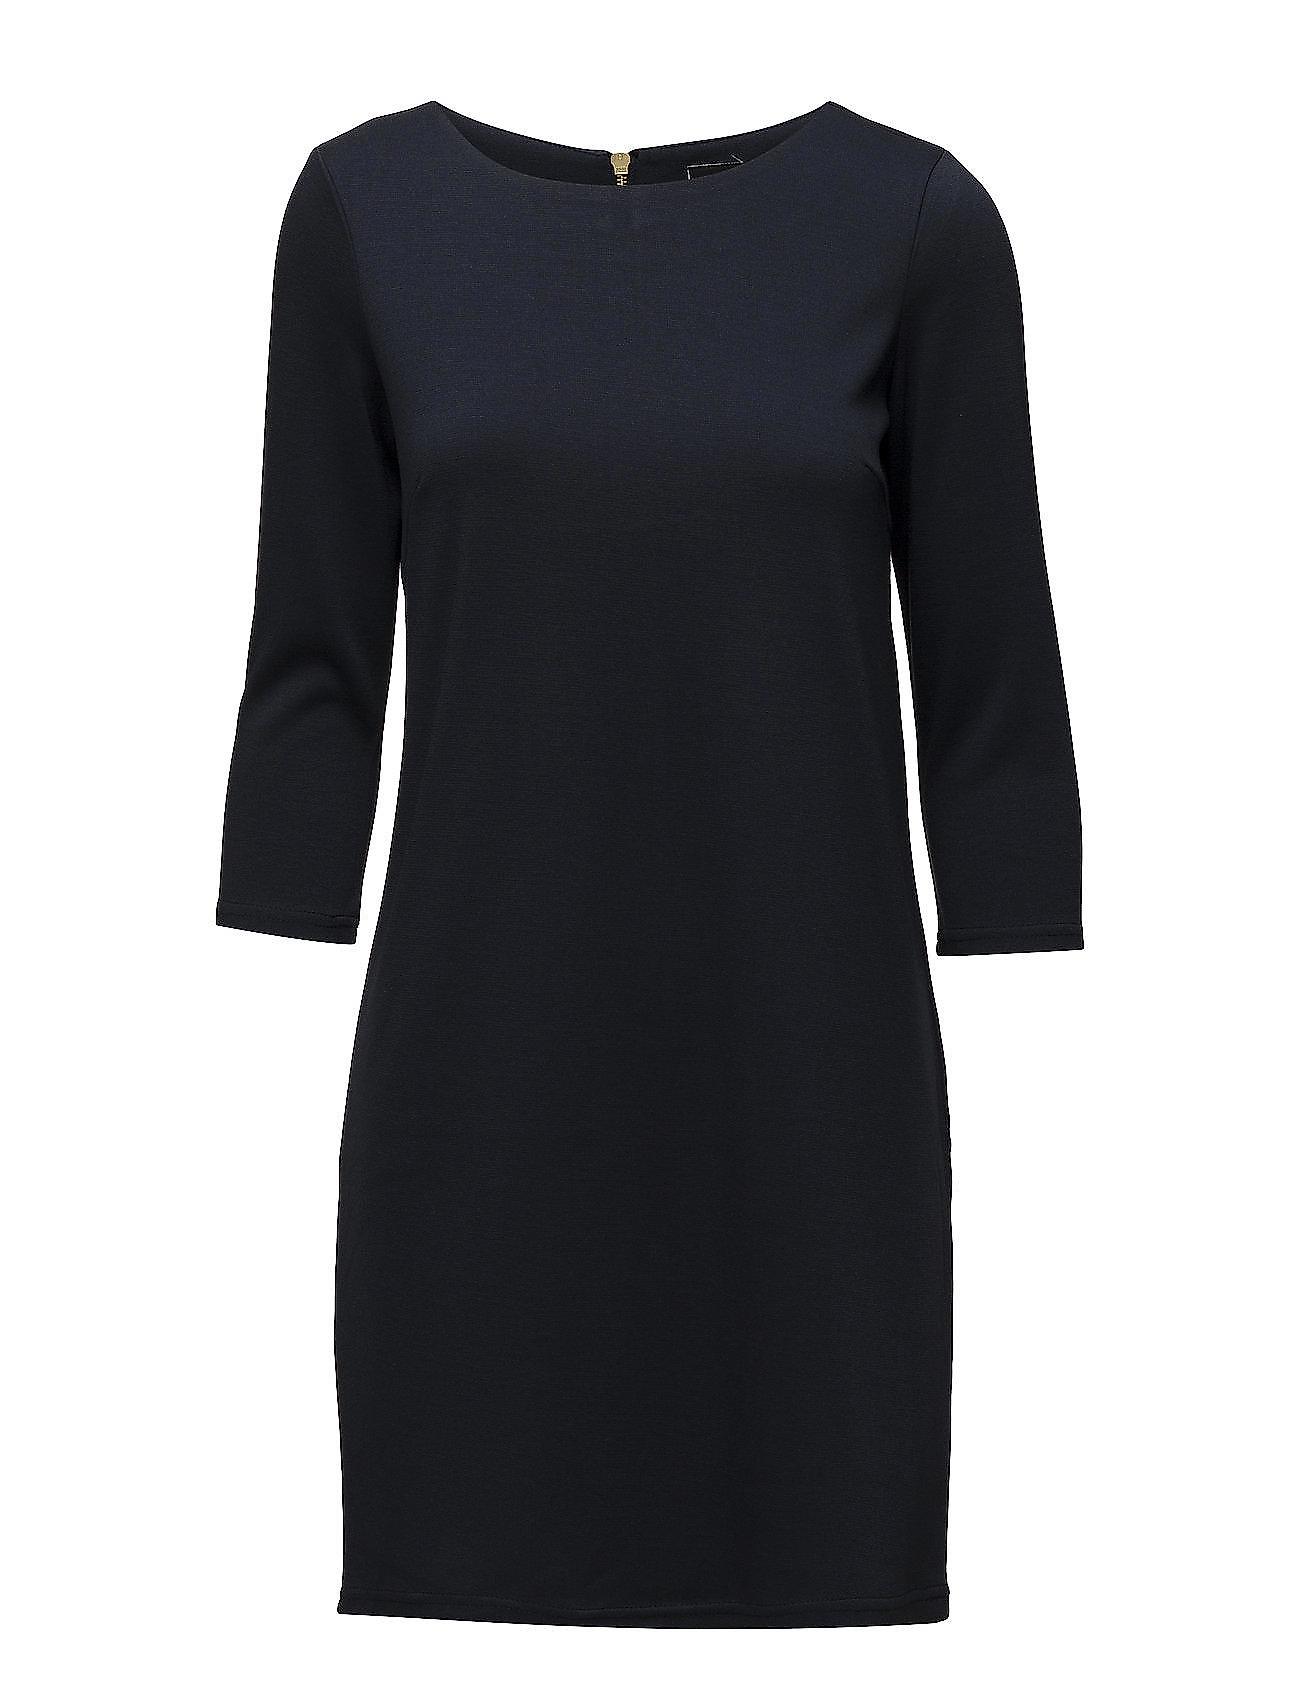 Image of VILA Vitinny New Dress-Noos Lyhyt Mekko Sininen VILA